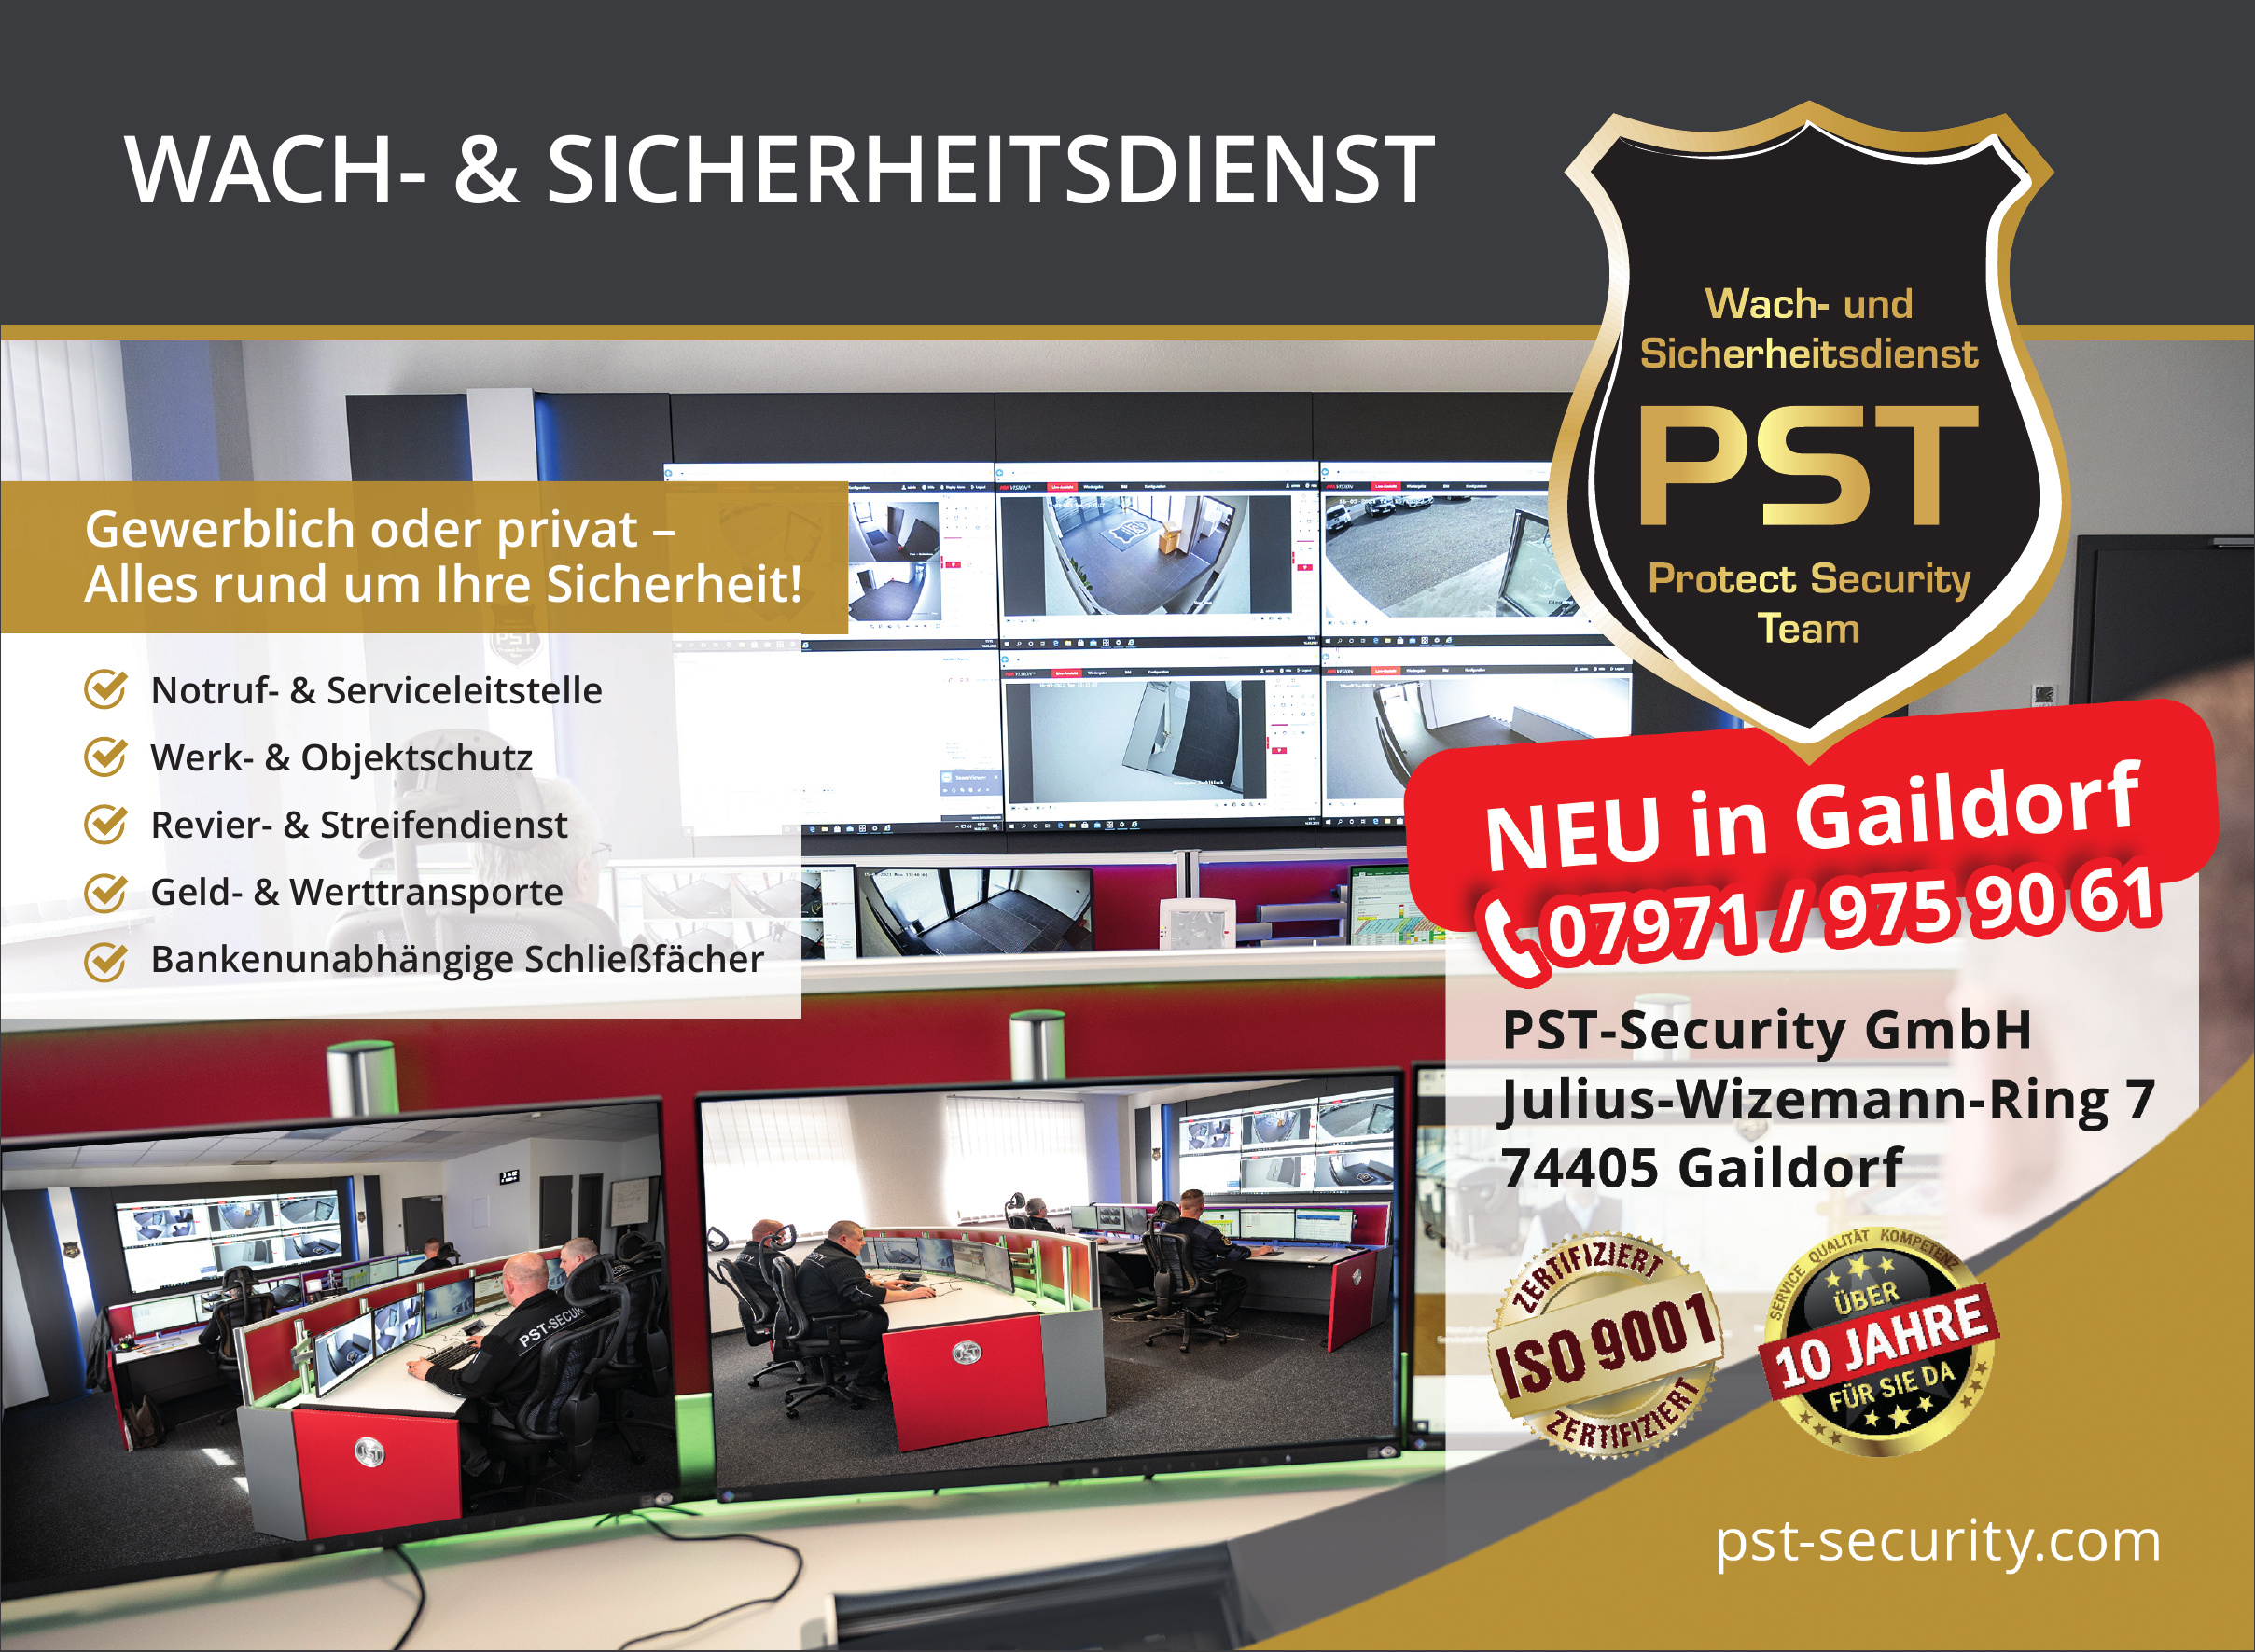 PST-Security GmbH